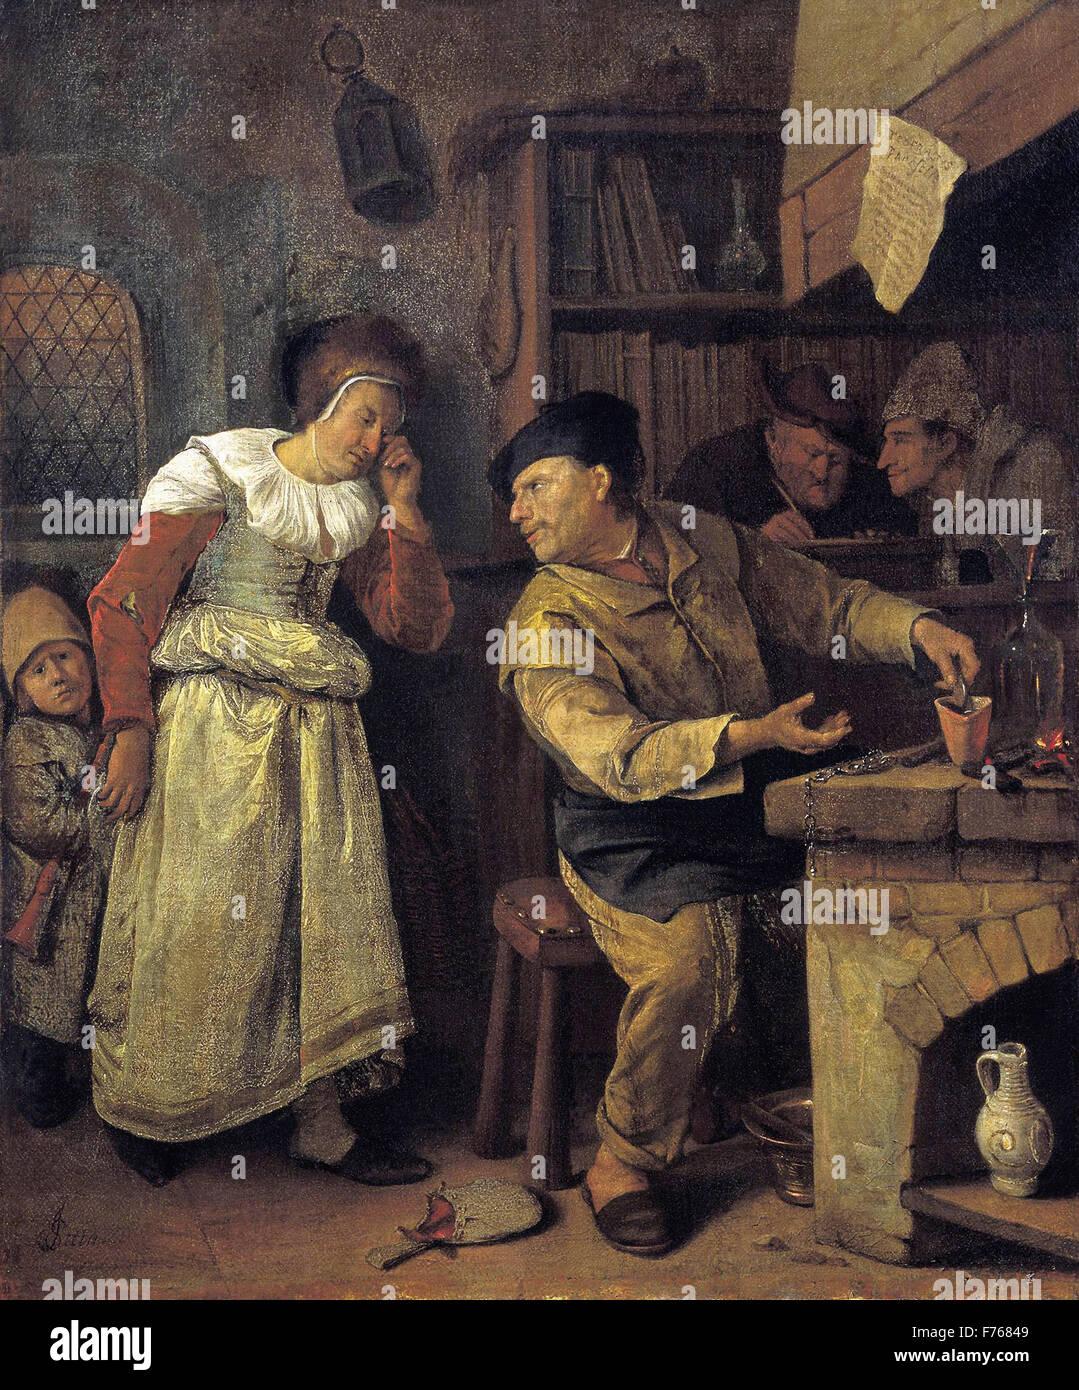 Jan Steen - The Alchemist - Stock Image